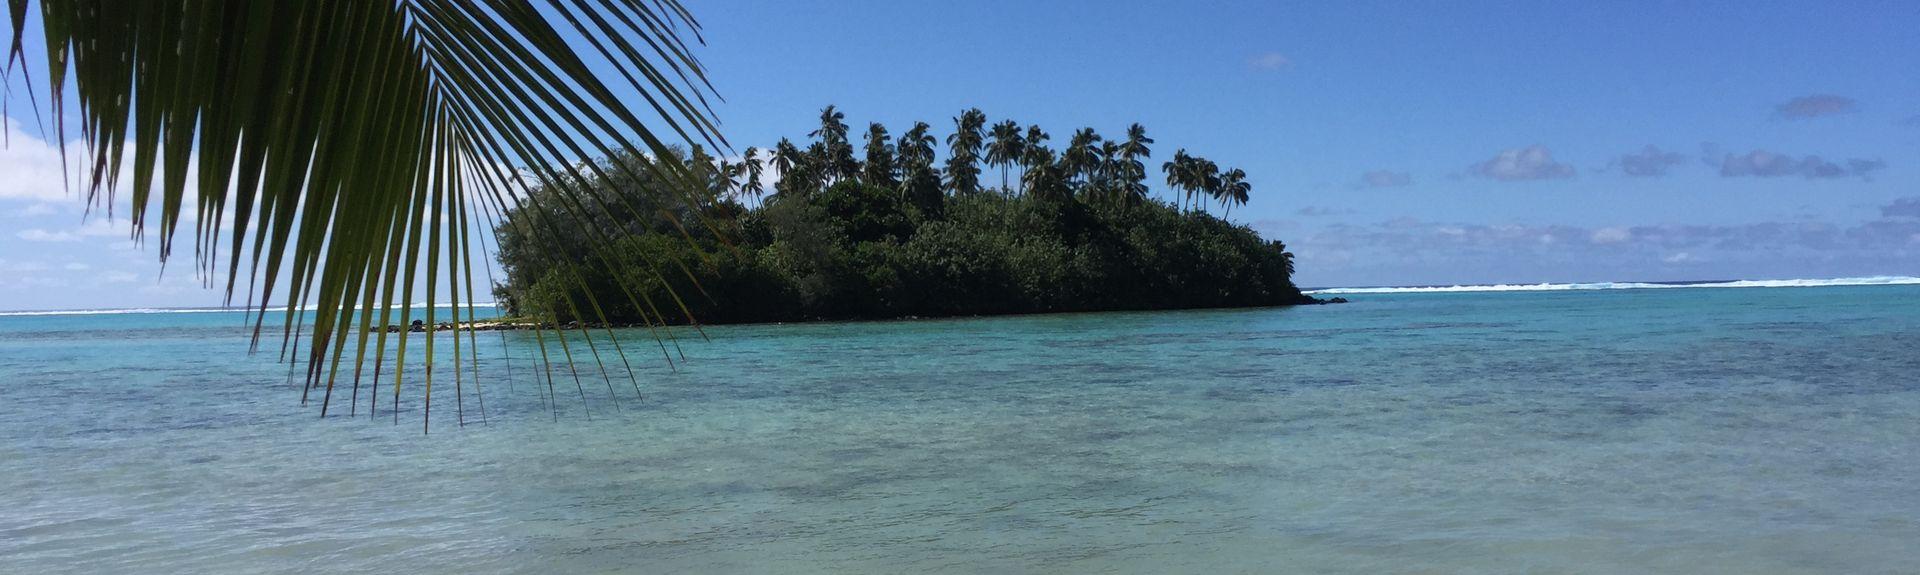 Areiti Tapere, Cook Islands